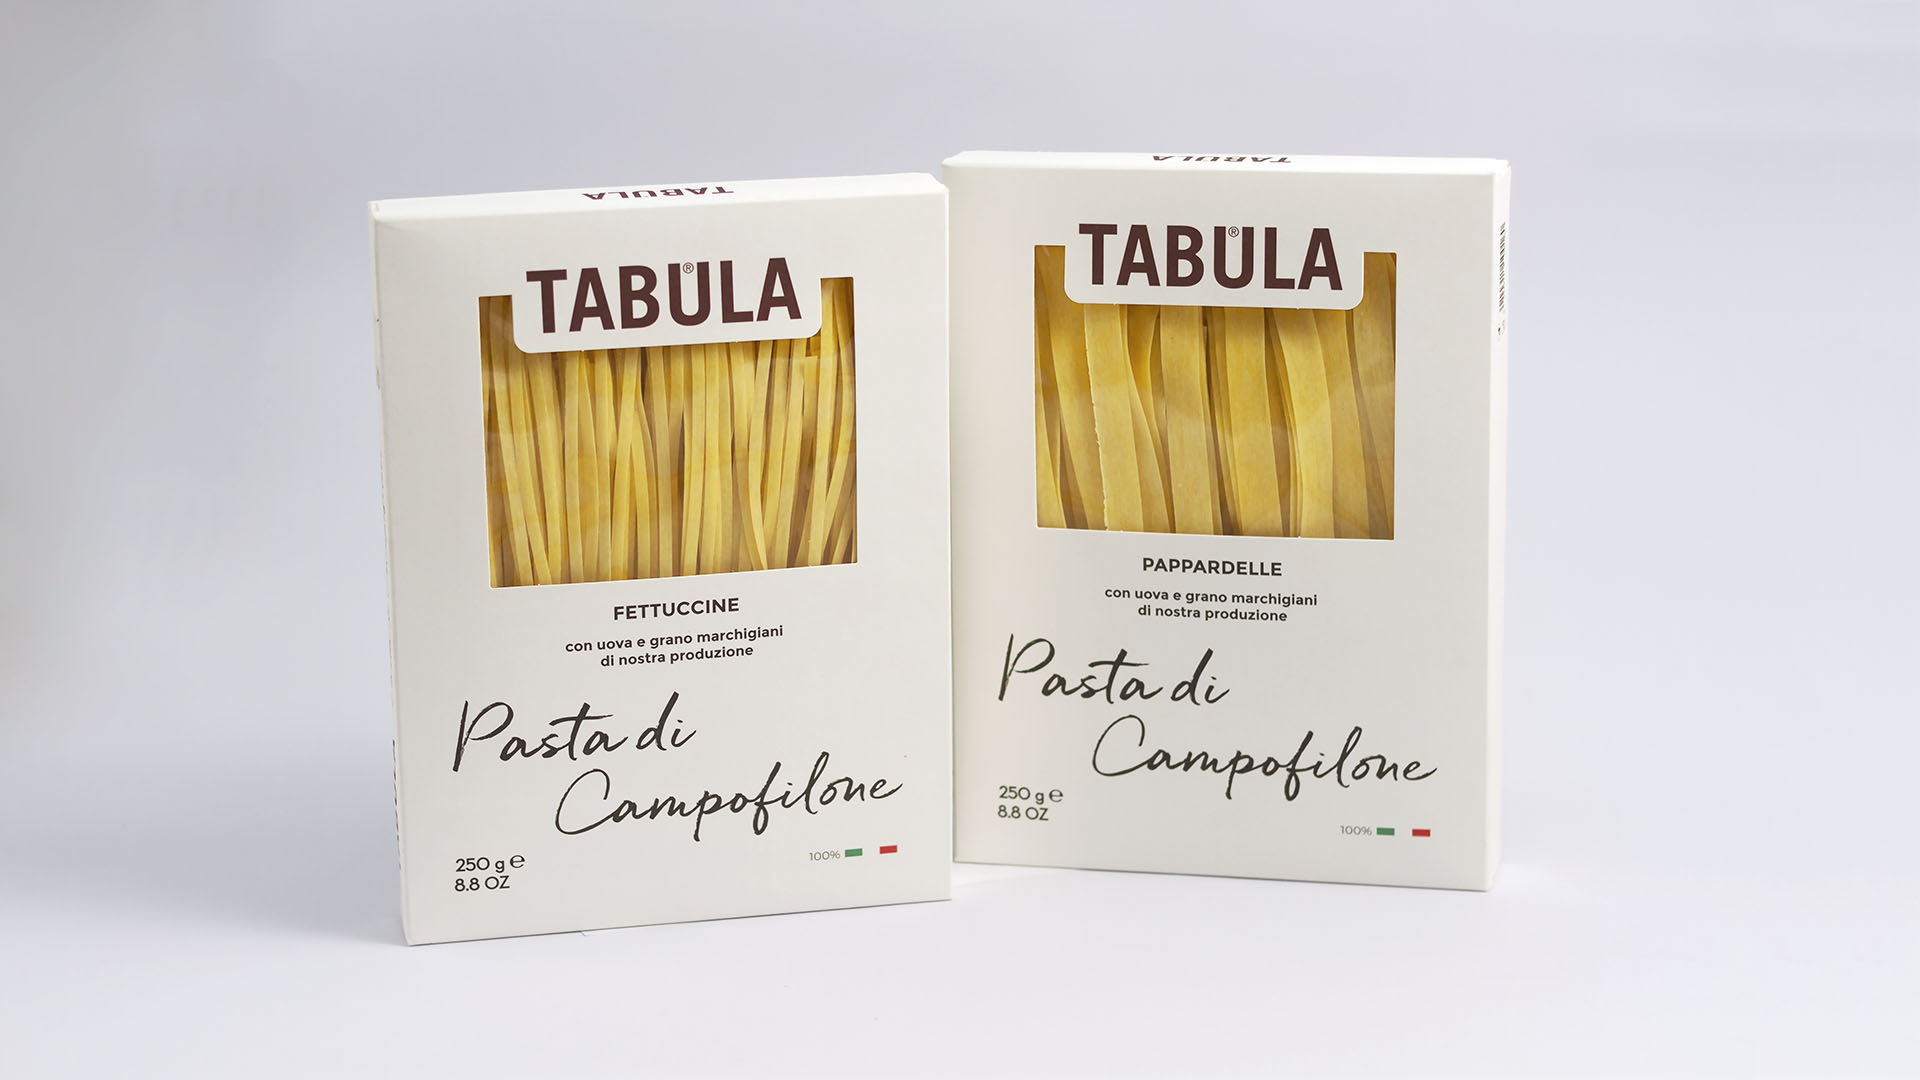 Campofilone dry pasta